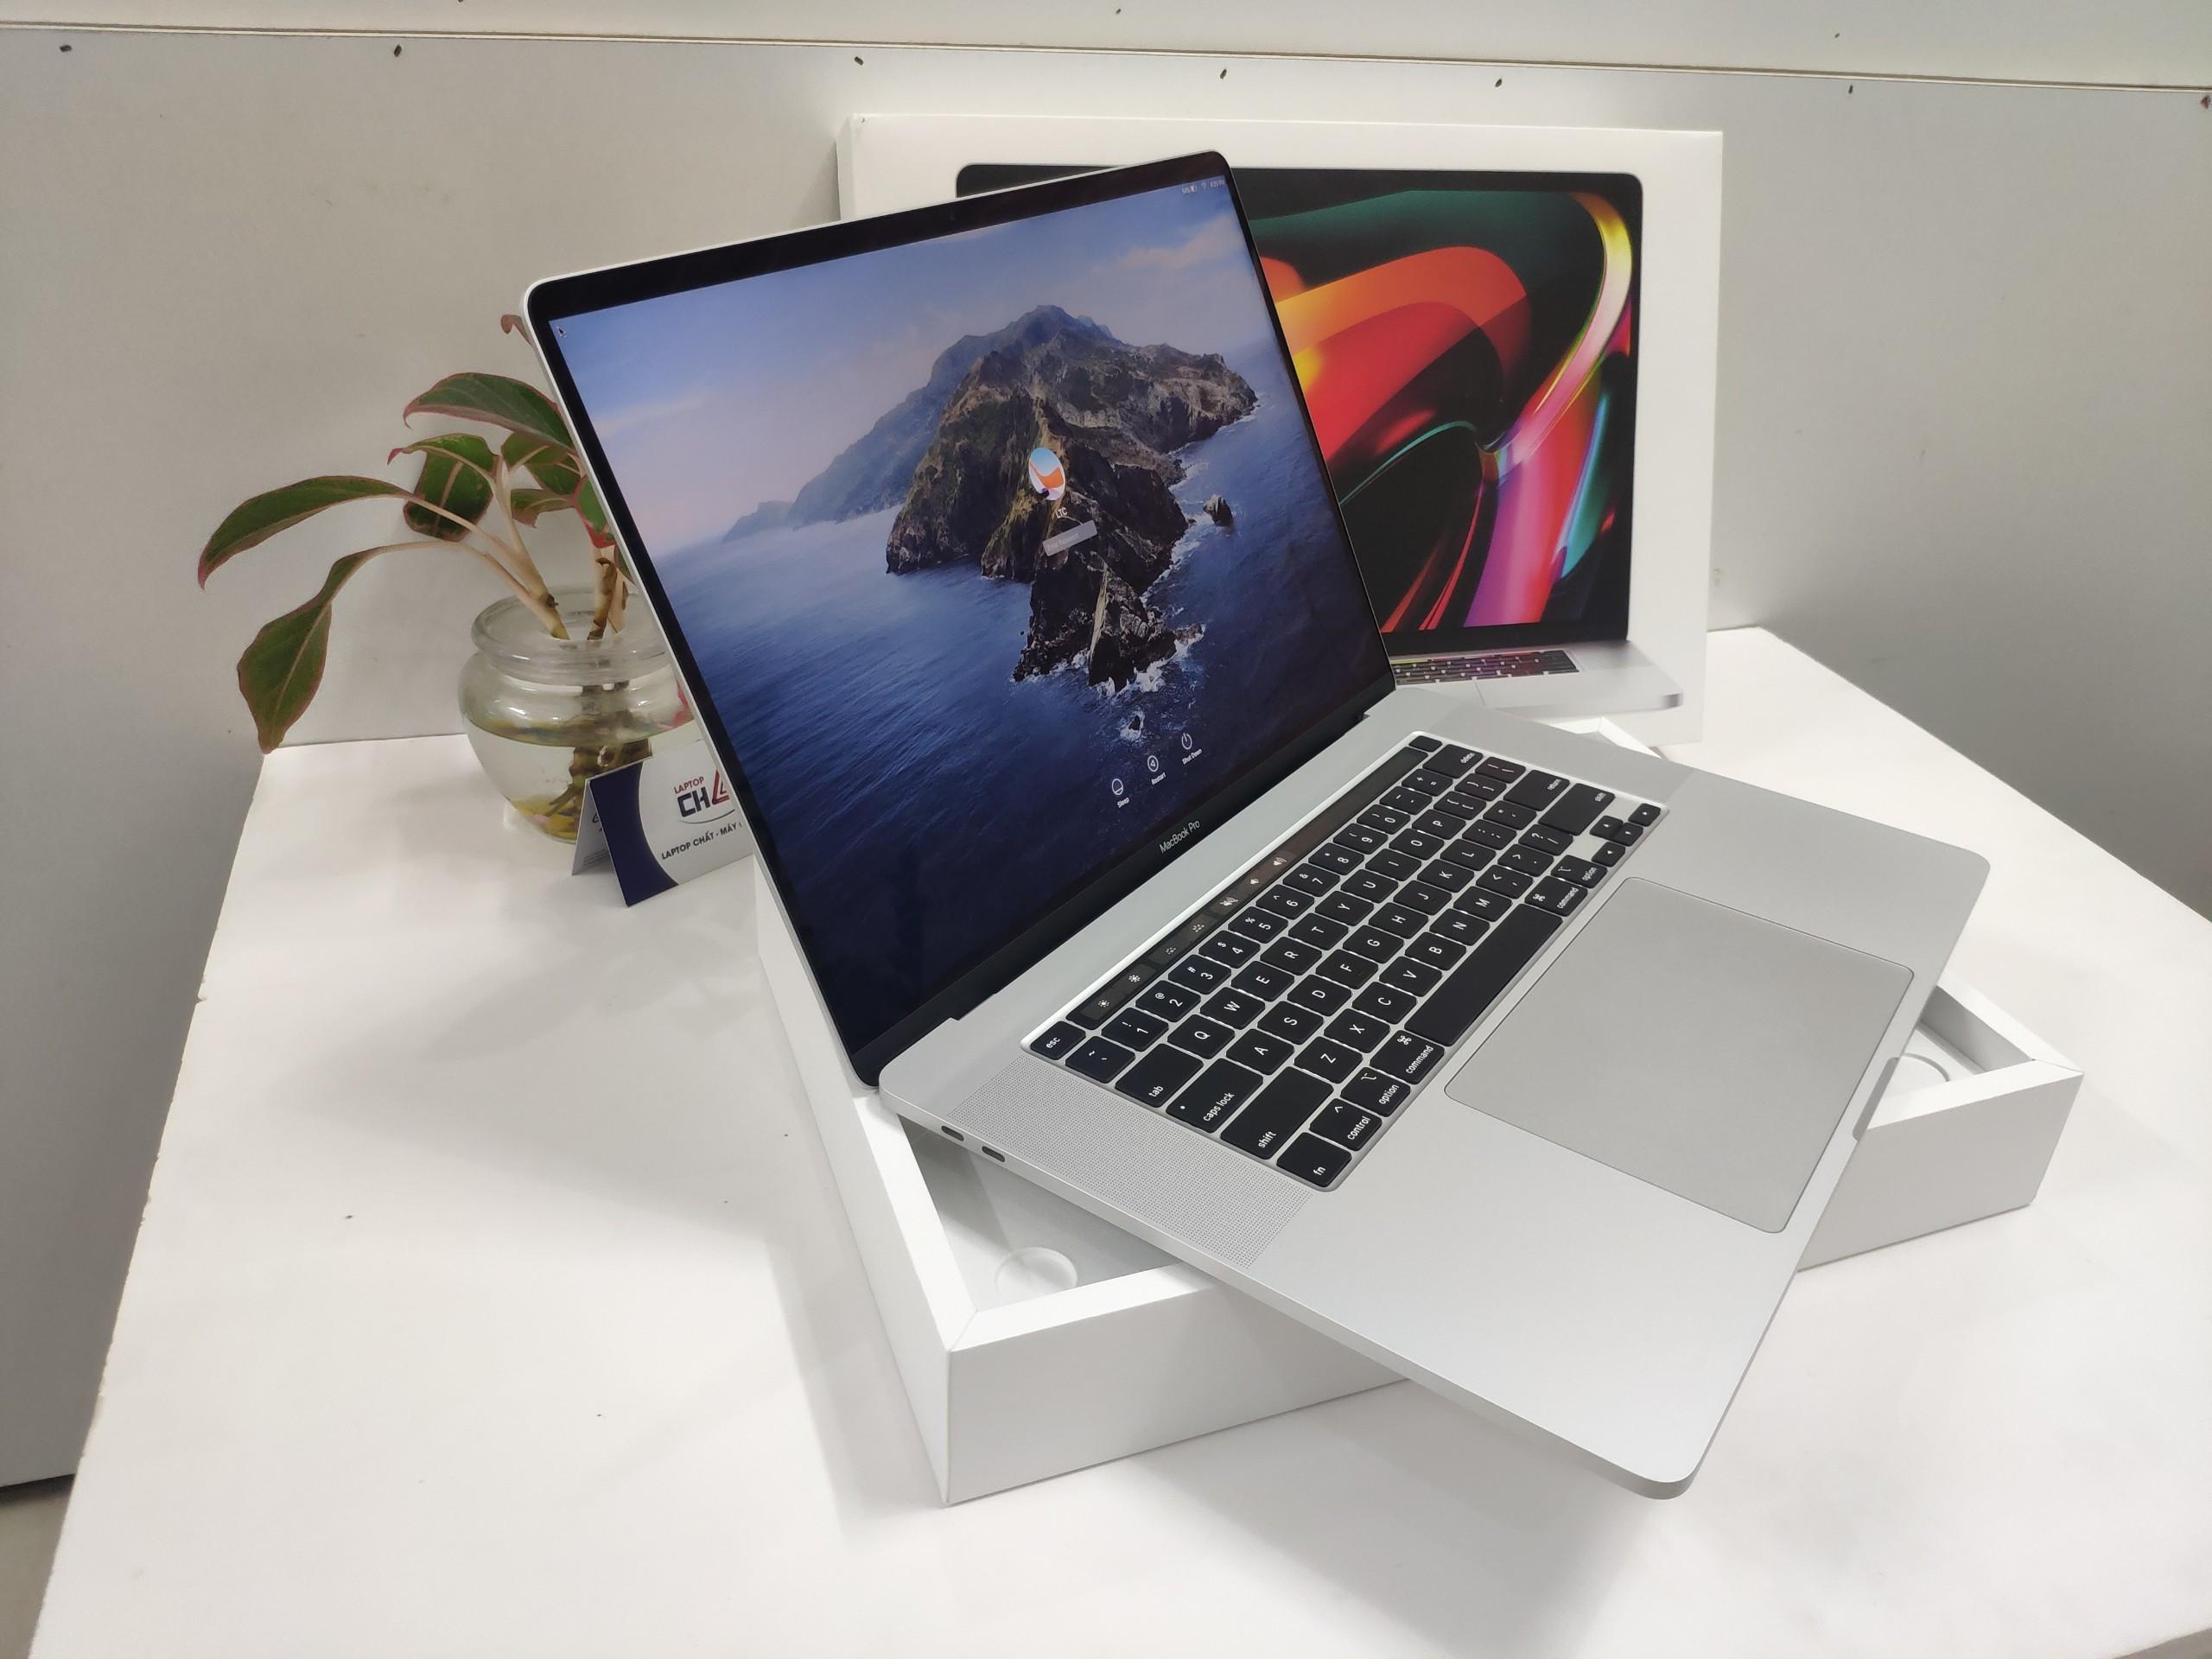 MacBook Pro 2019 CoreI9 2.4Ghz / 64GB / 2TB / AMD 5500M 8GB